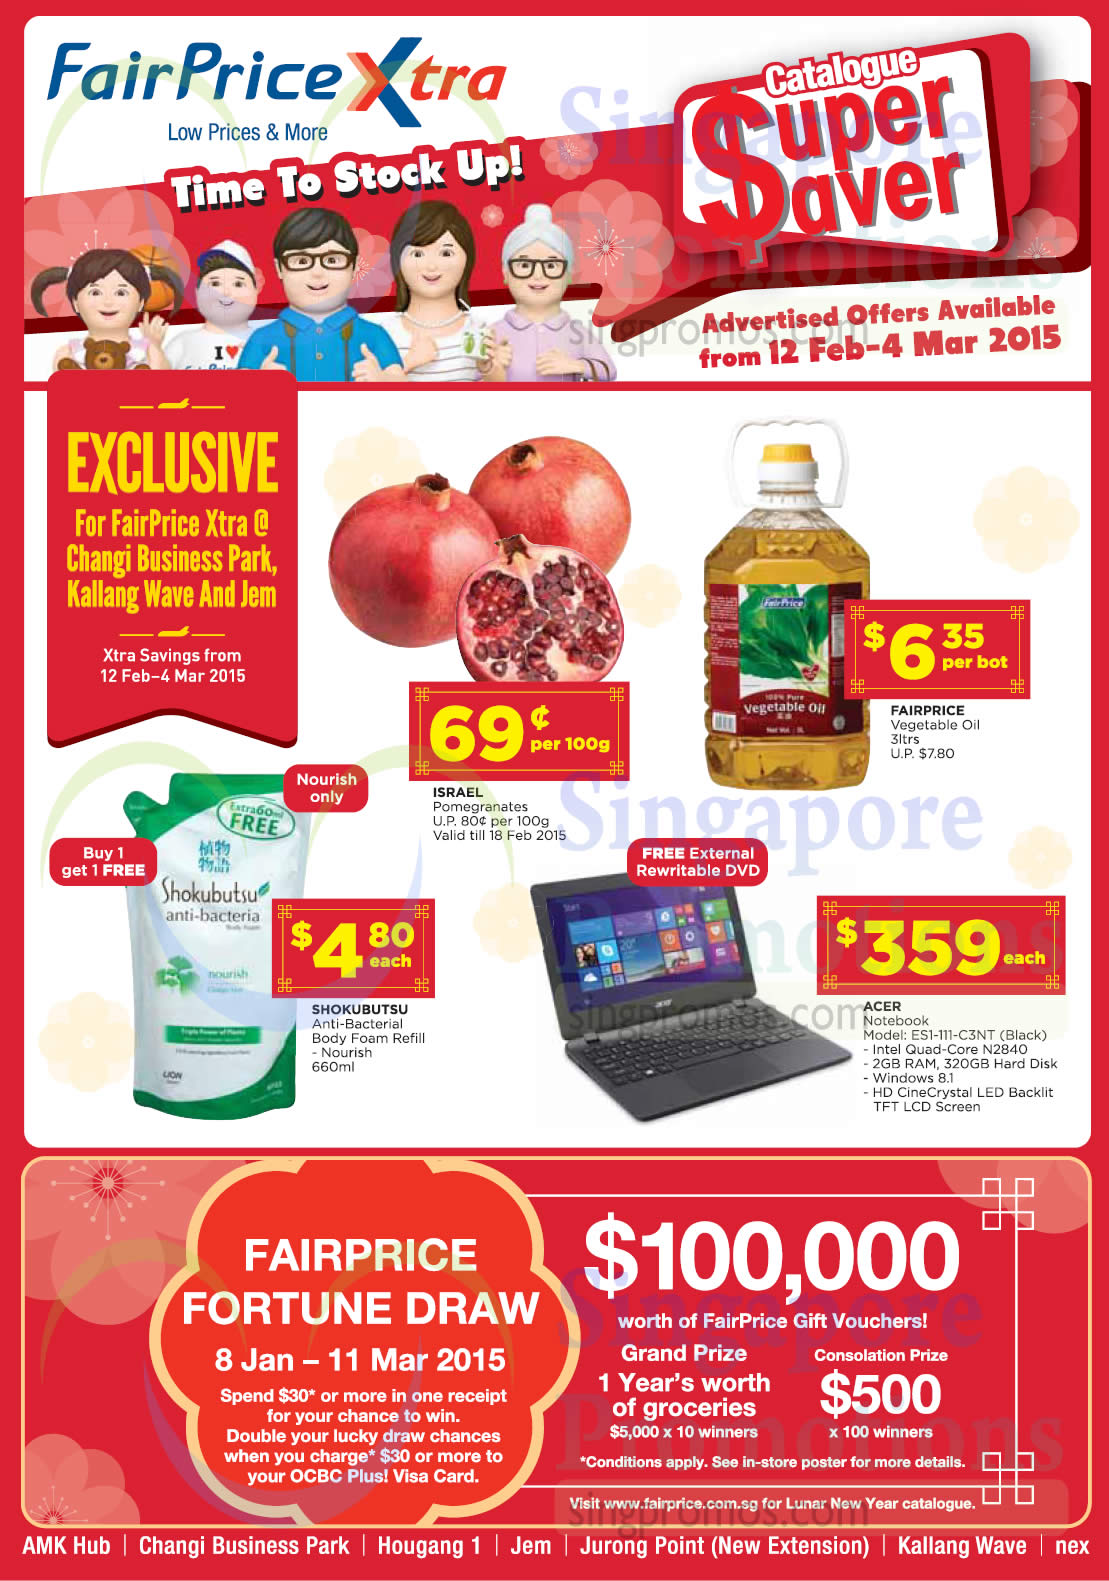 Acer ES1-111-C3NT Notebook, FairPrice Vegetable Oil, Shokubutsu Anti-Bacterial Body Foam Refill, Israel Pomegranates